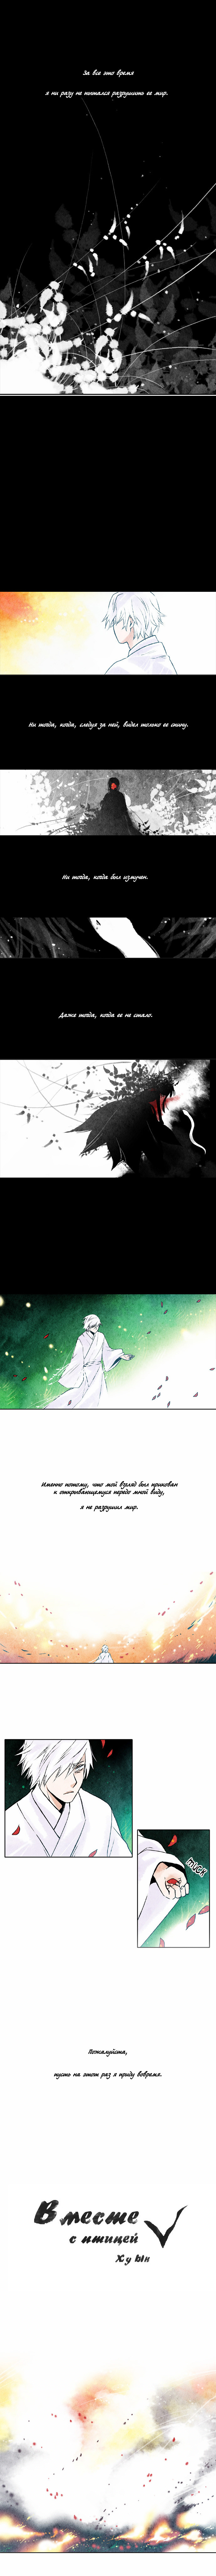 https://r1.ninemanga.com/comics/pic2/39/22503/1257059/1541334891802.jpg Page 1